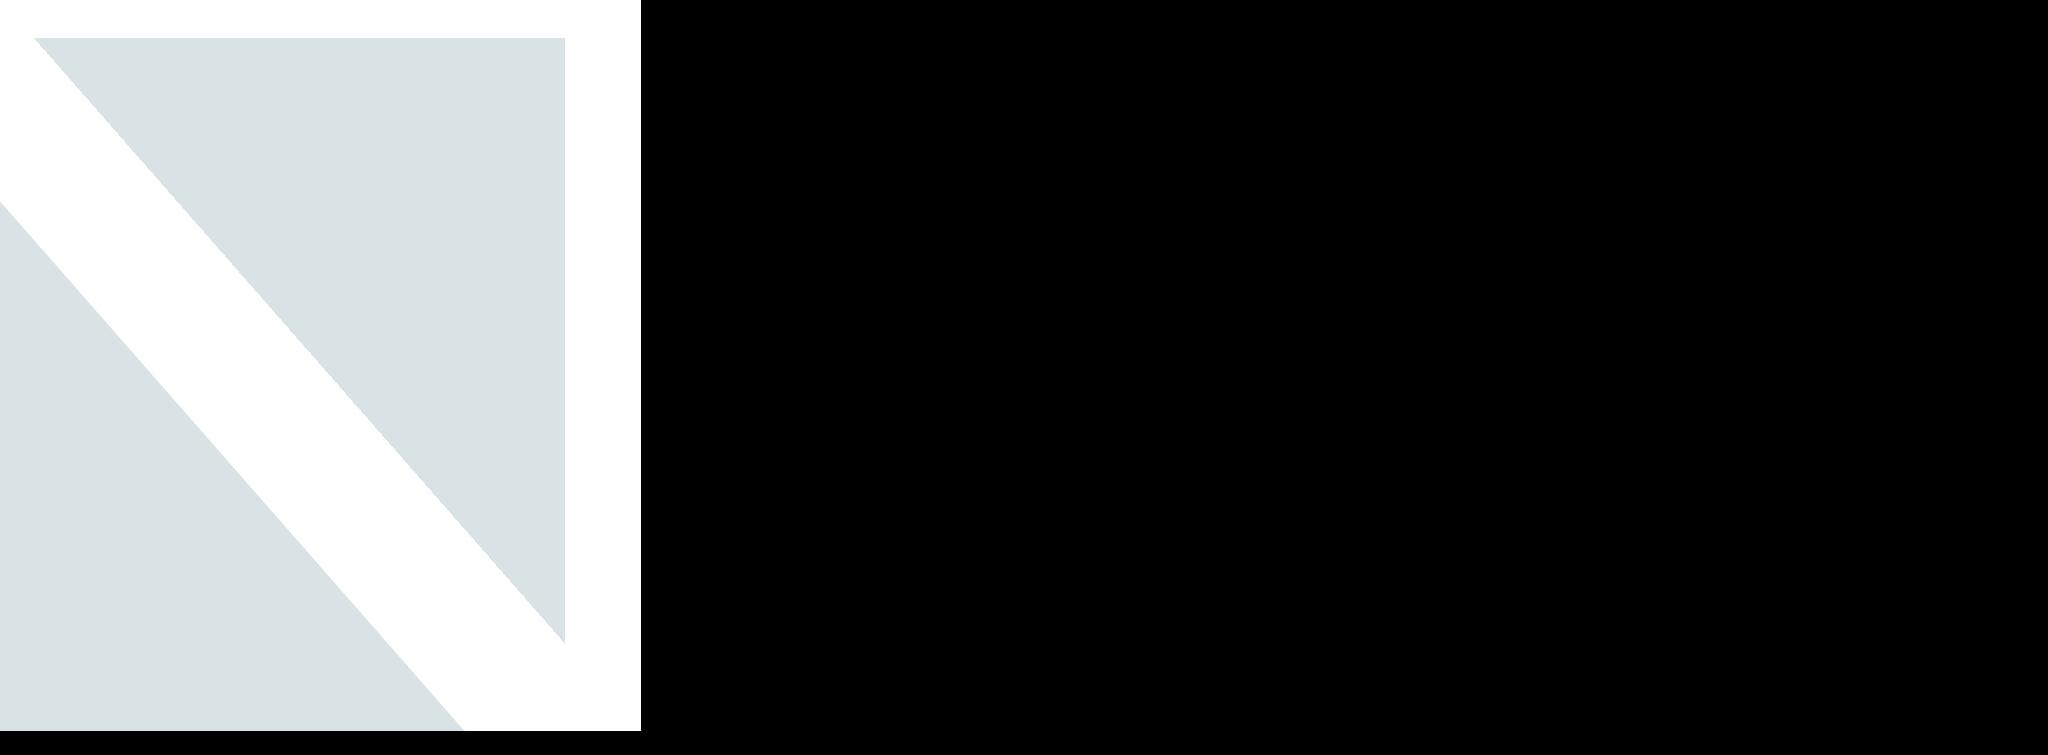 fasce-laterali-sinistra